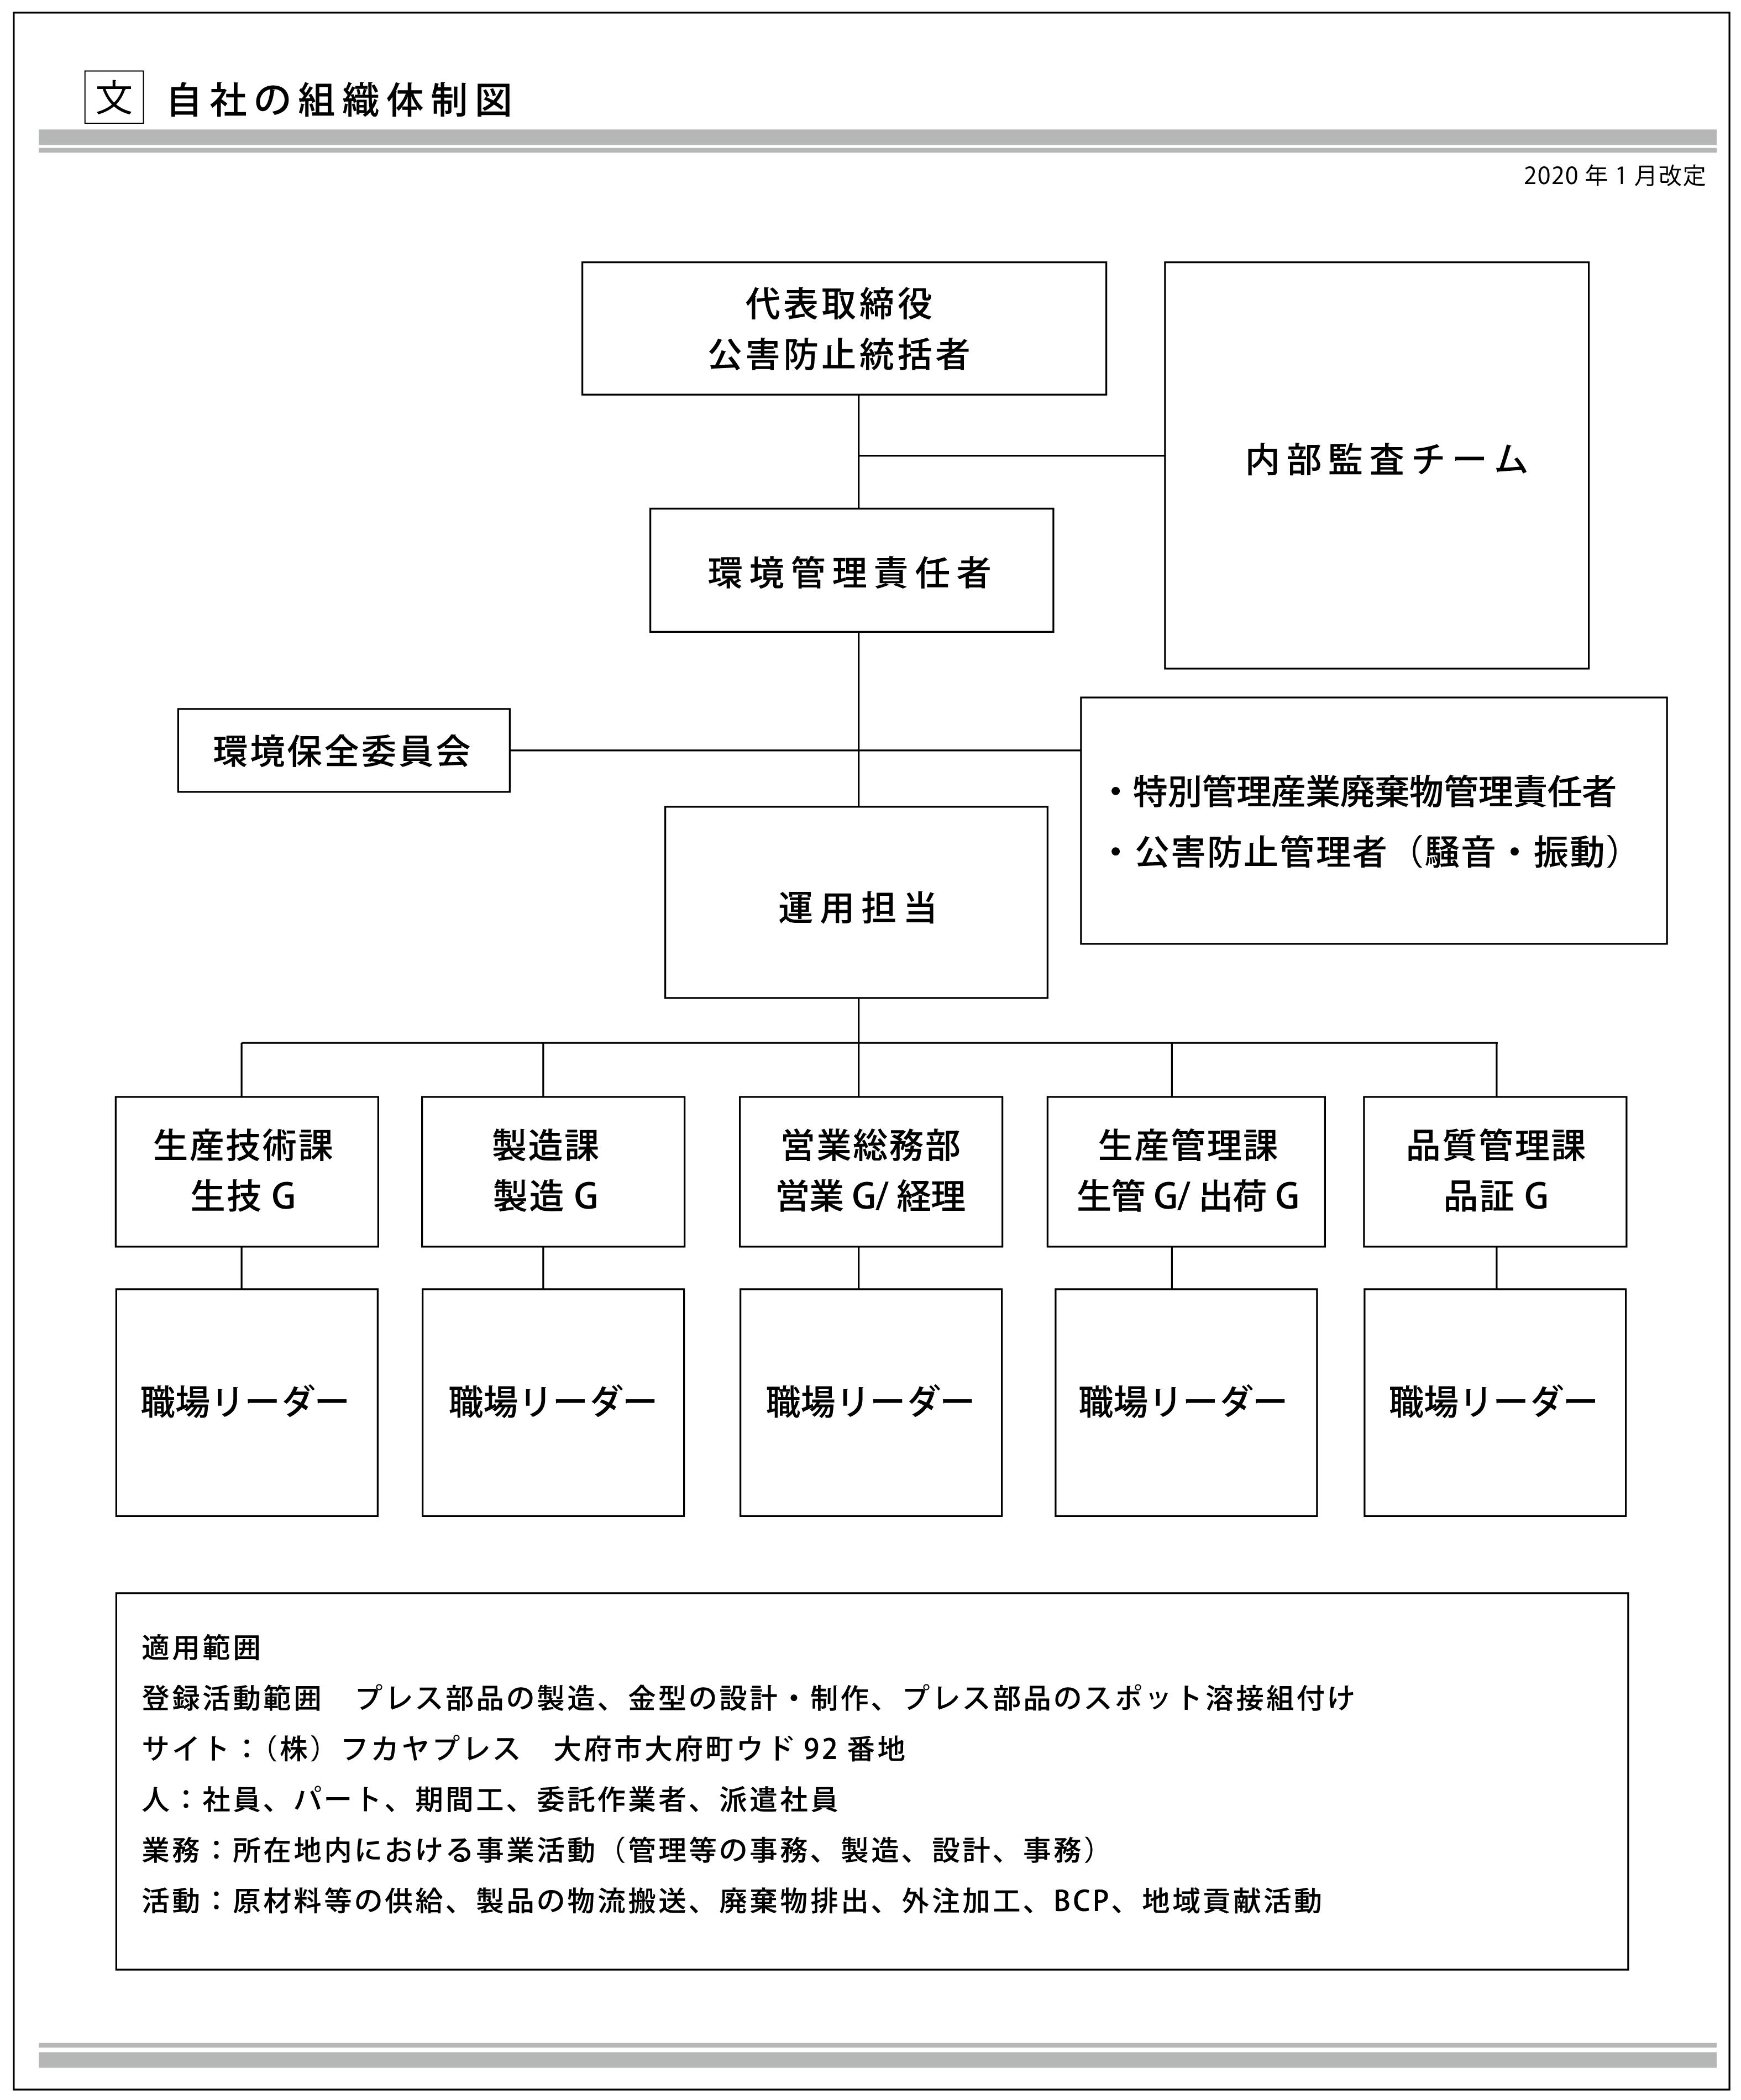 自社の組織体制図